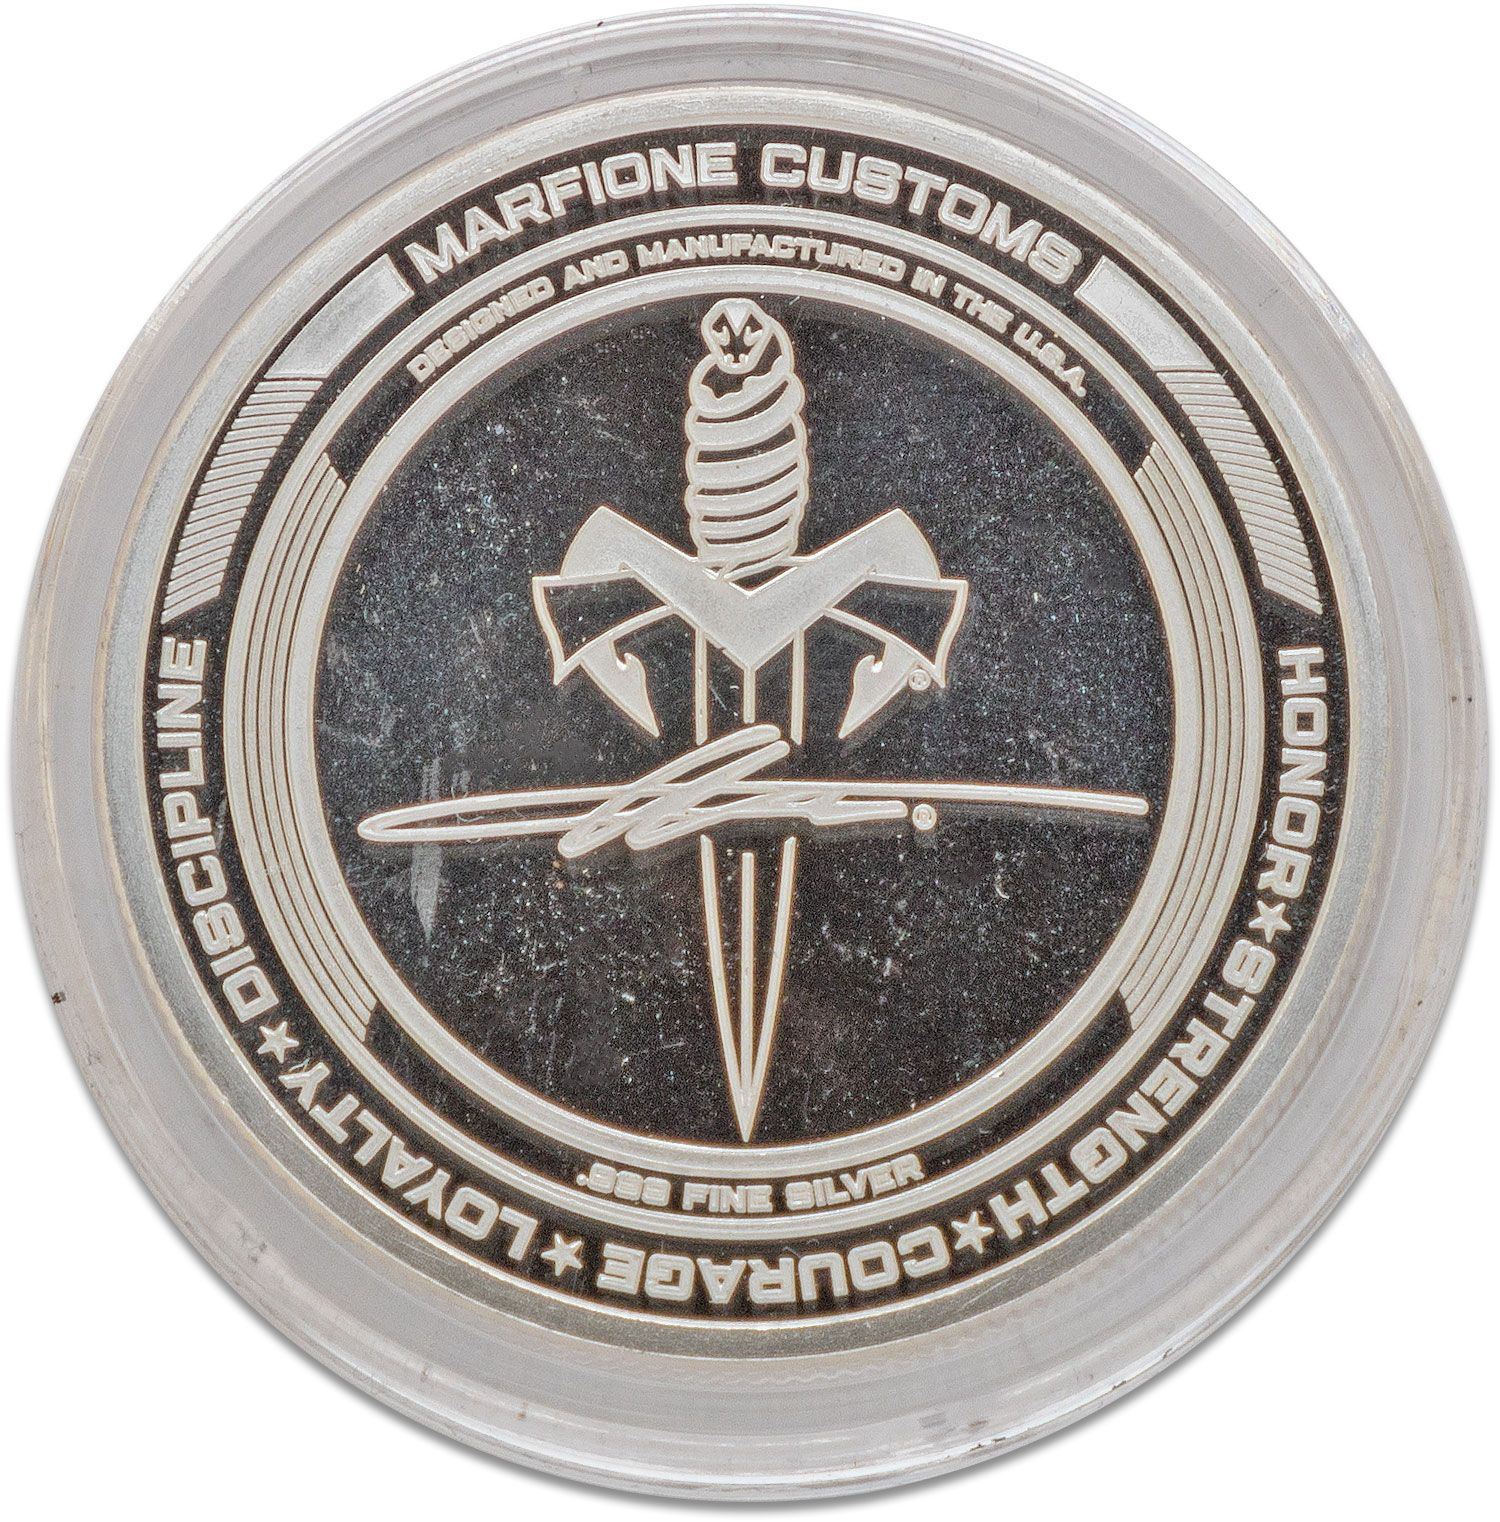 Marfione Custom Knives Custom 25th Anniversary .999 Fine Silver Challenge Coin